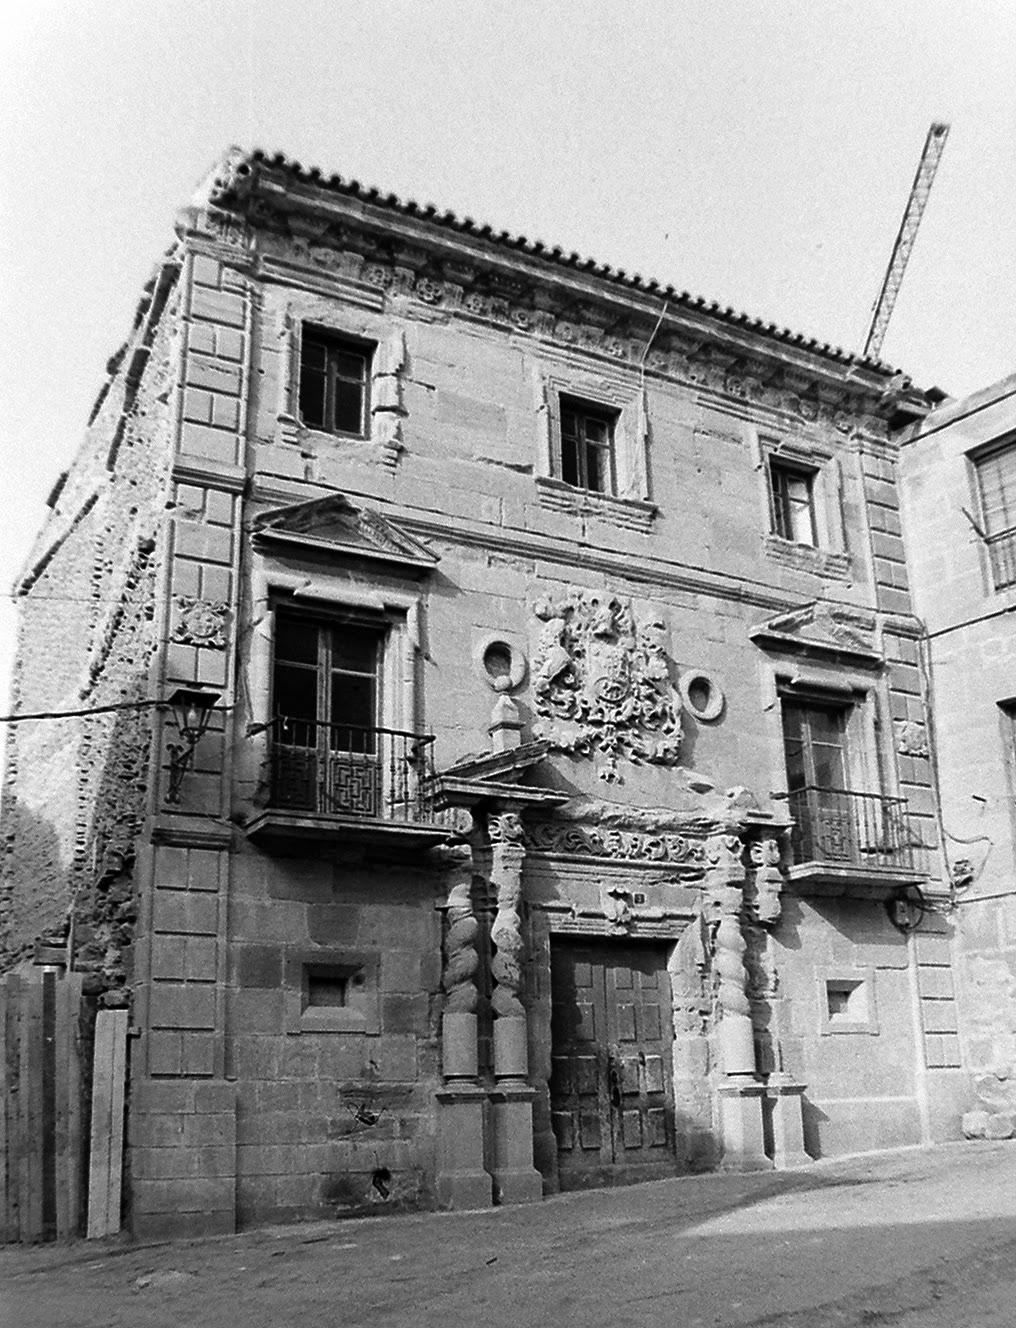 Casas solariegas en la rioja 181 haro i palacio de los - Casas prefabricadas la rioja ...